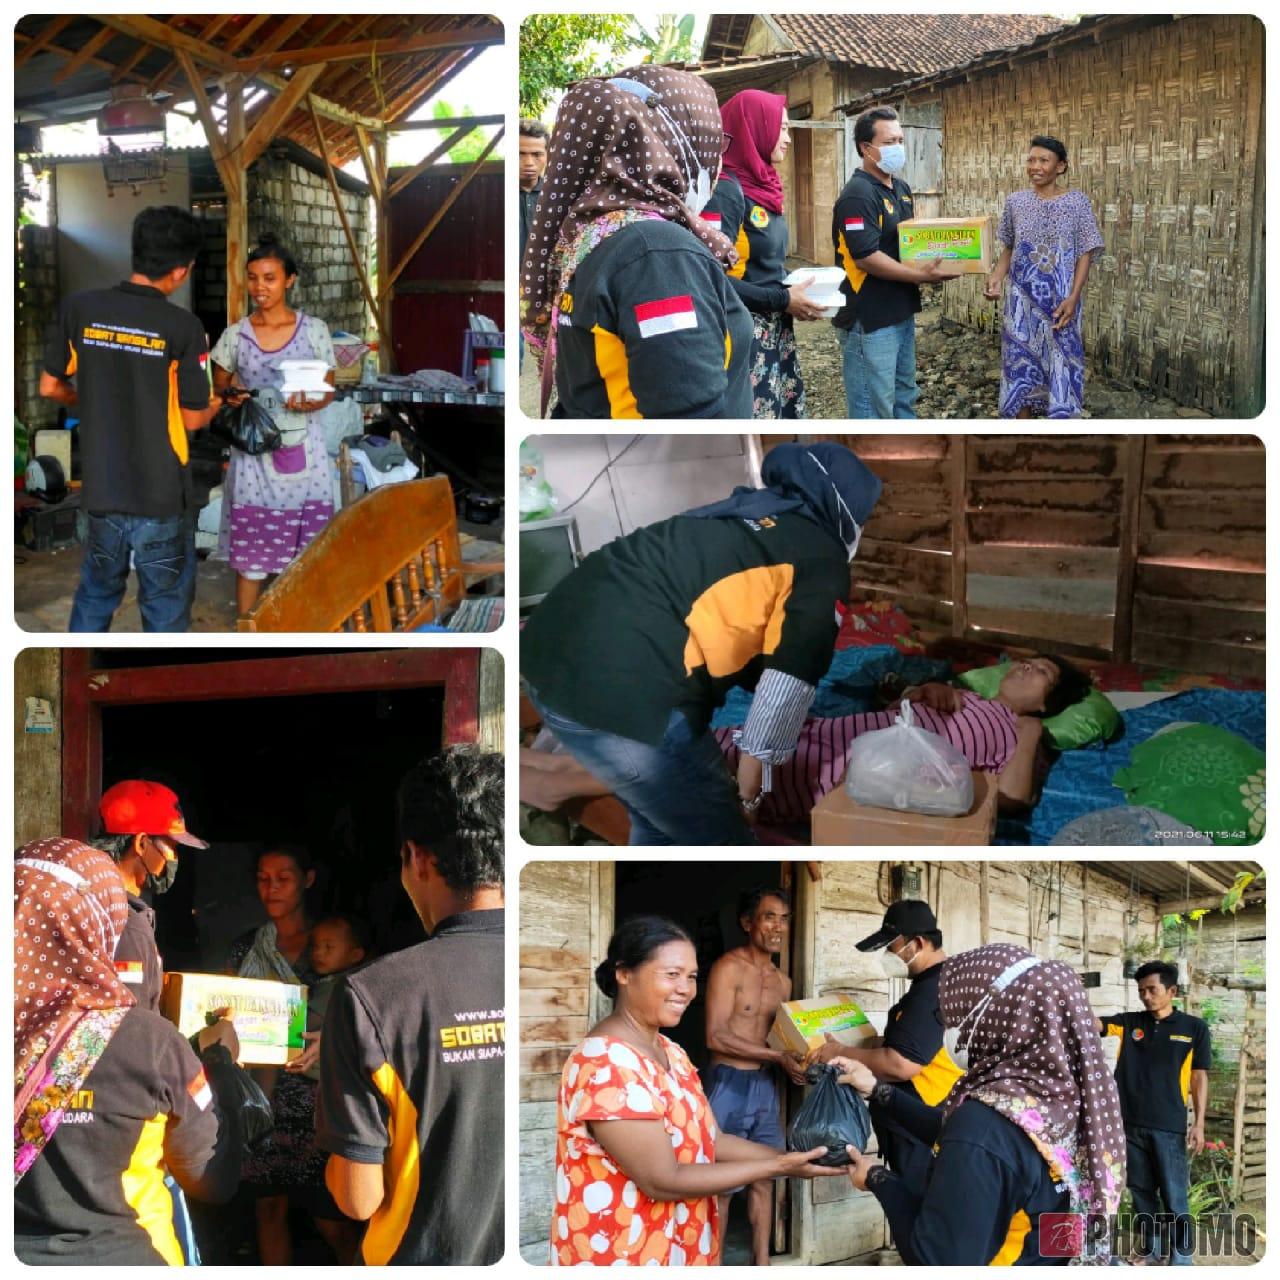 Jum'at Silaturahmi, Belajar Peduli dusun Banjar Melati, Banjarworo